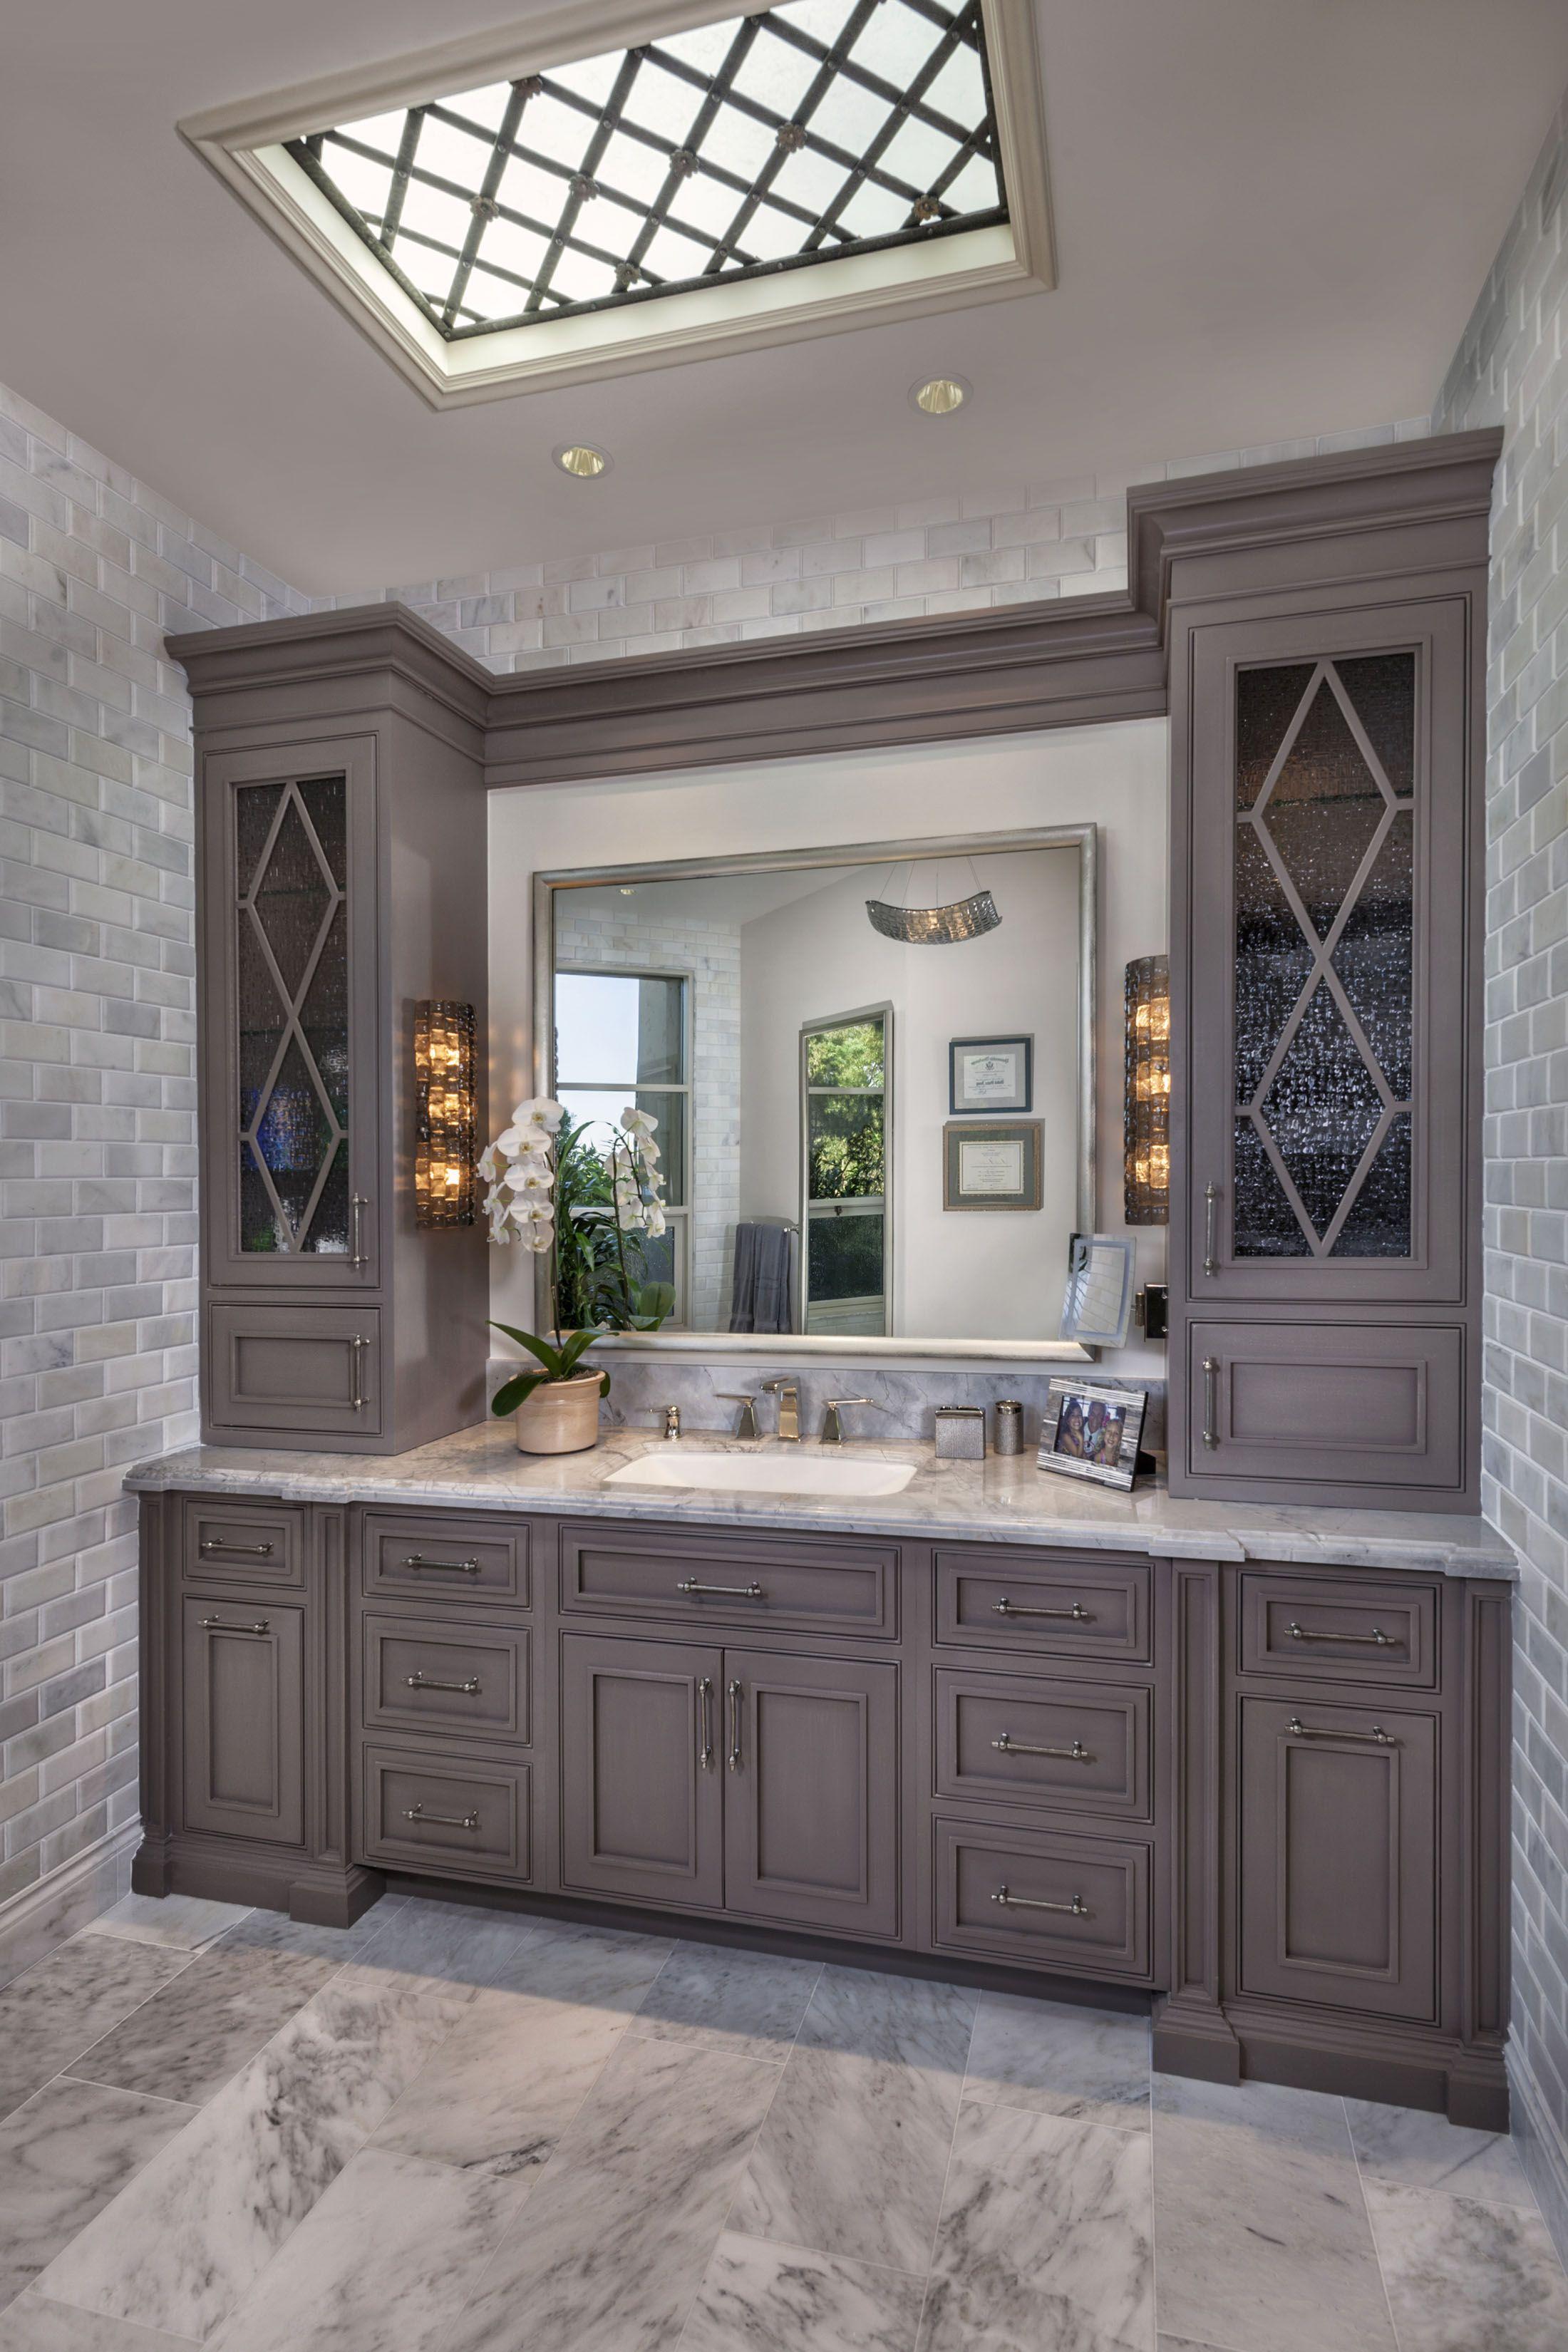 Custom Master Bath Cabinetry By Habersham | Habersham | House Design